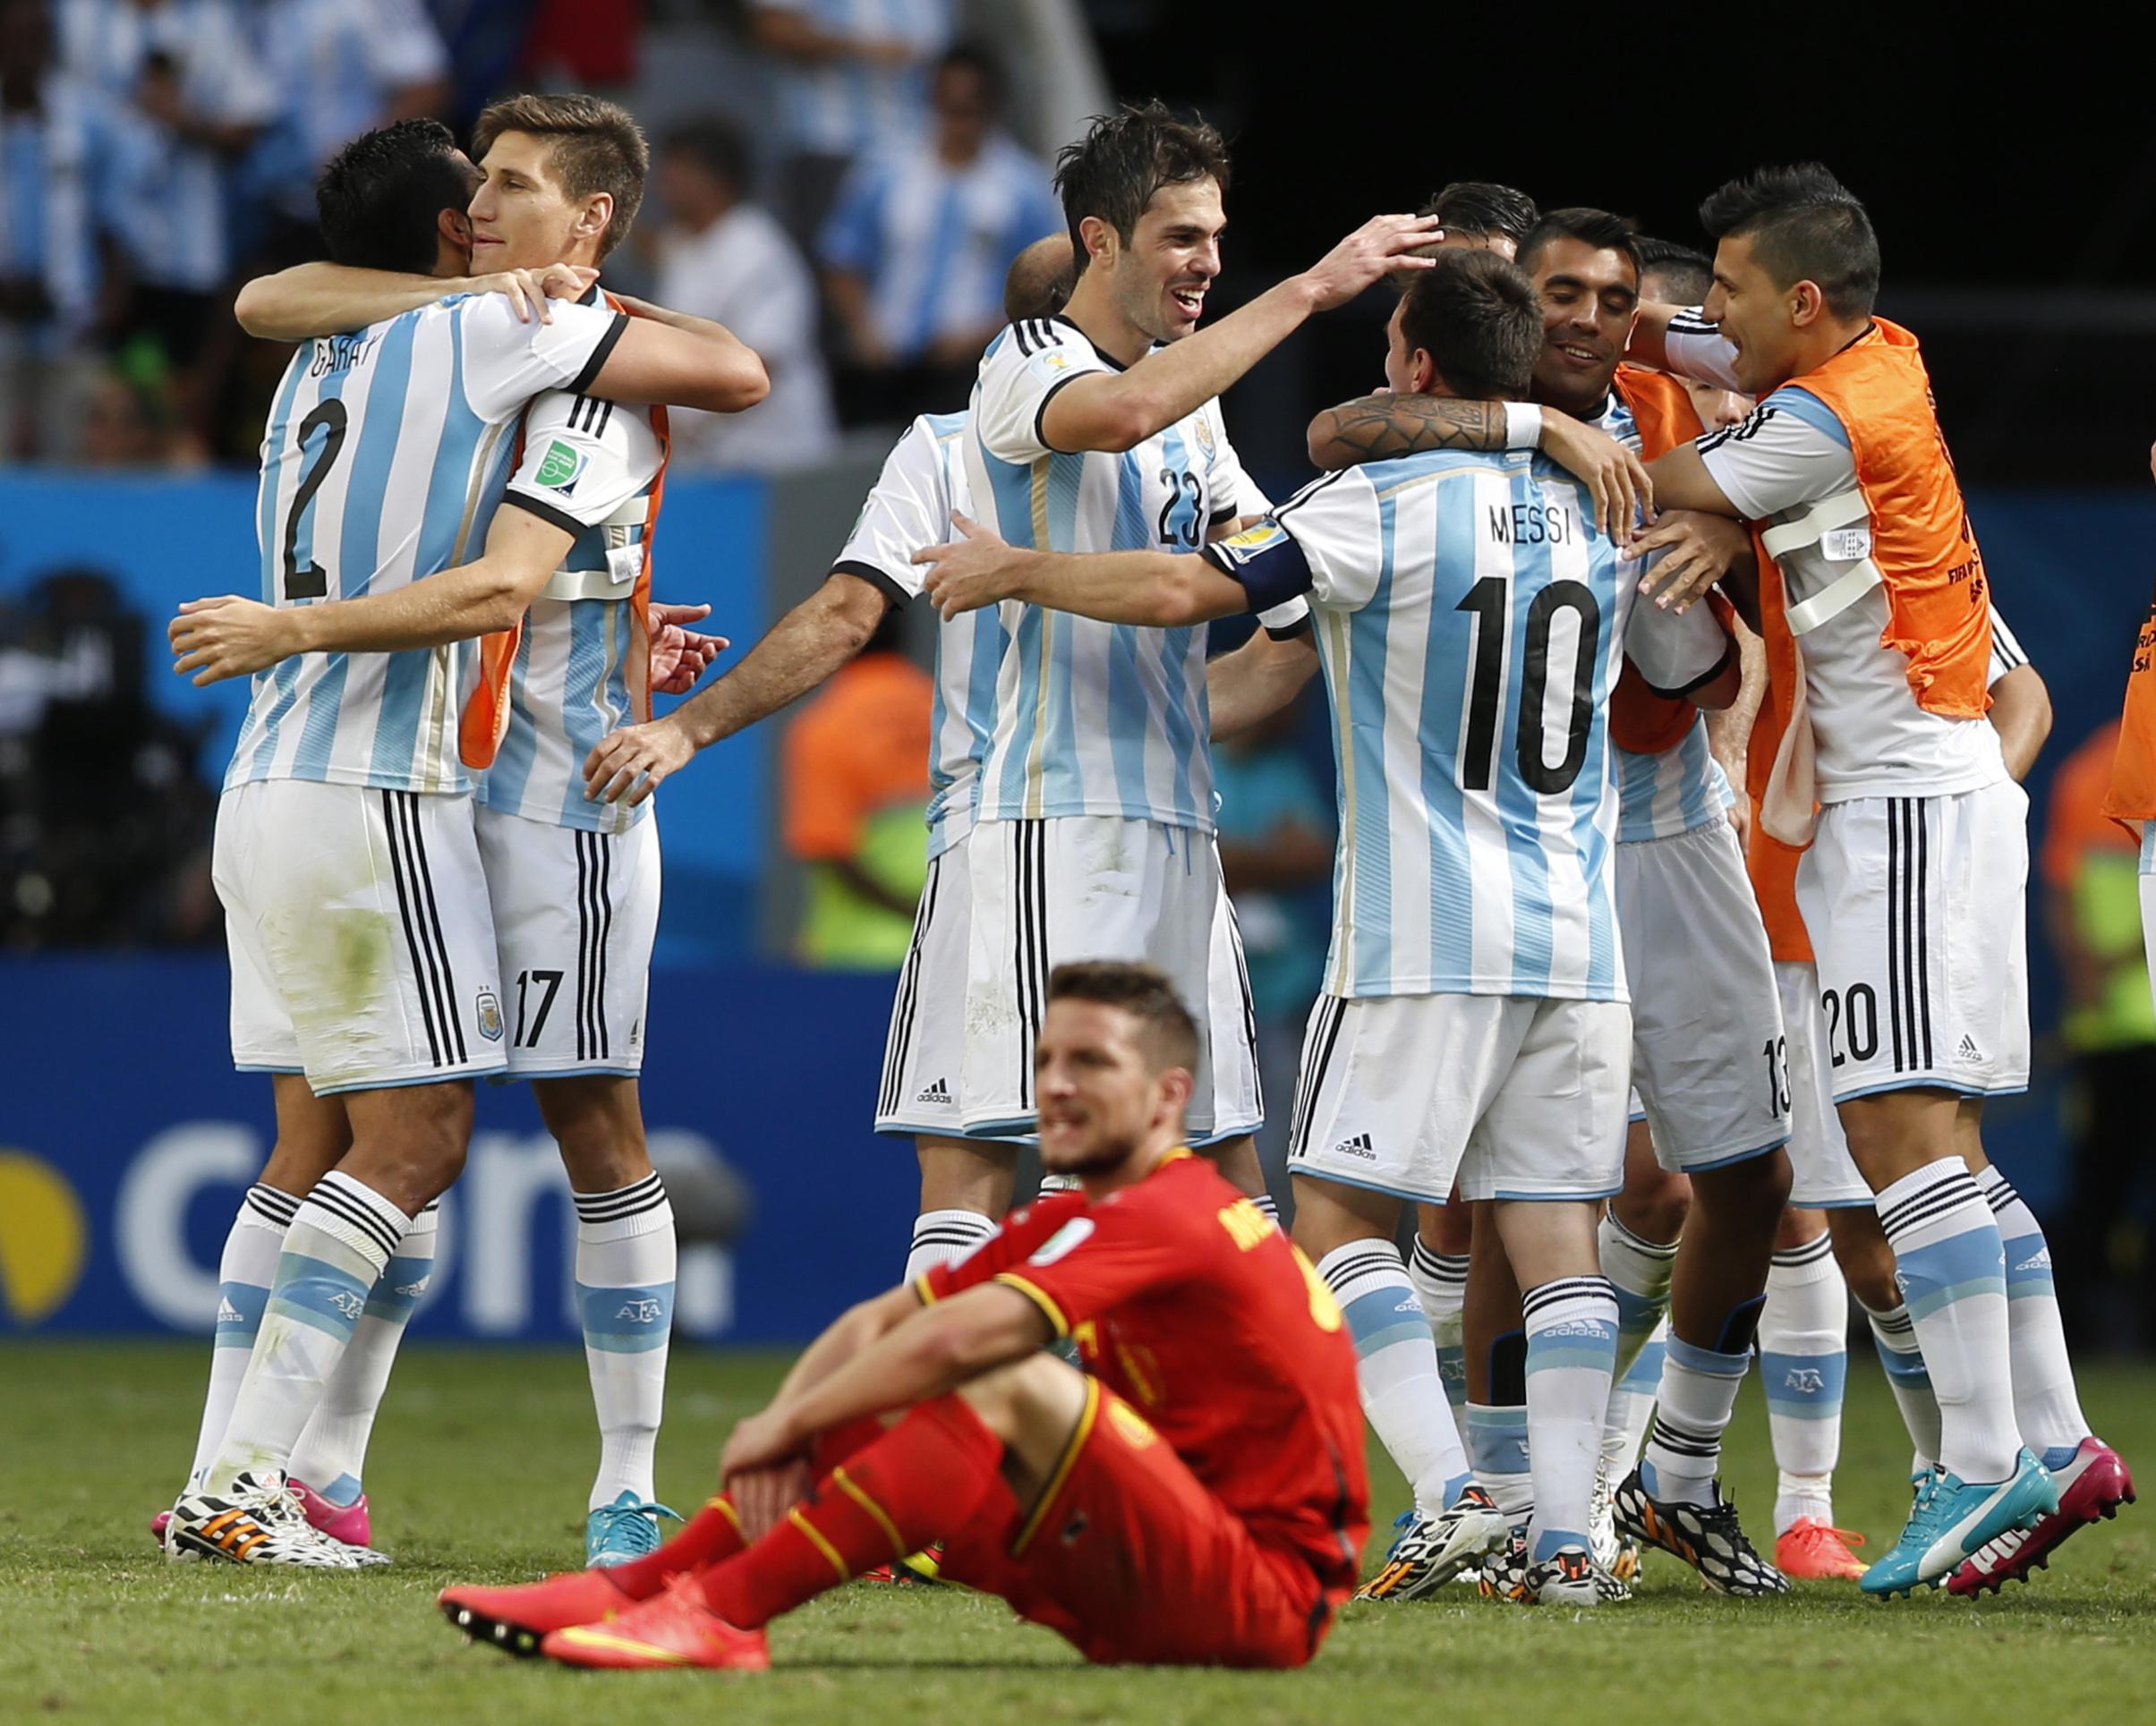 Argentina comemora vitória